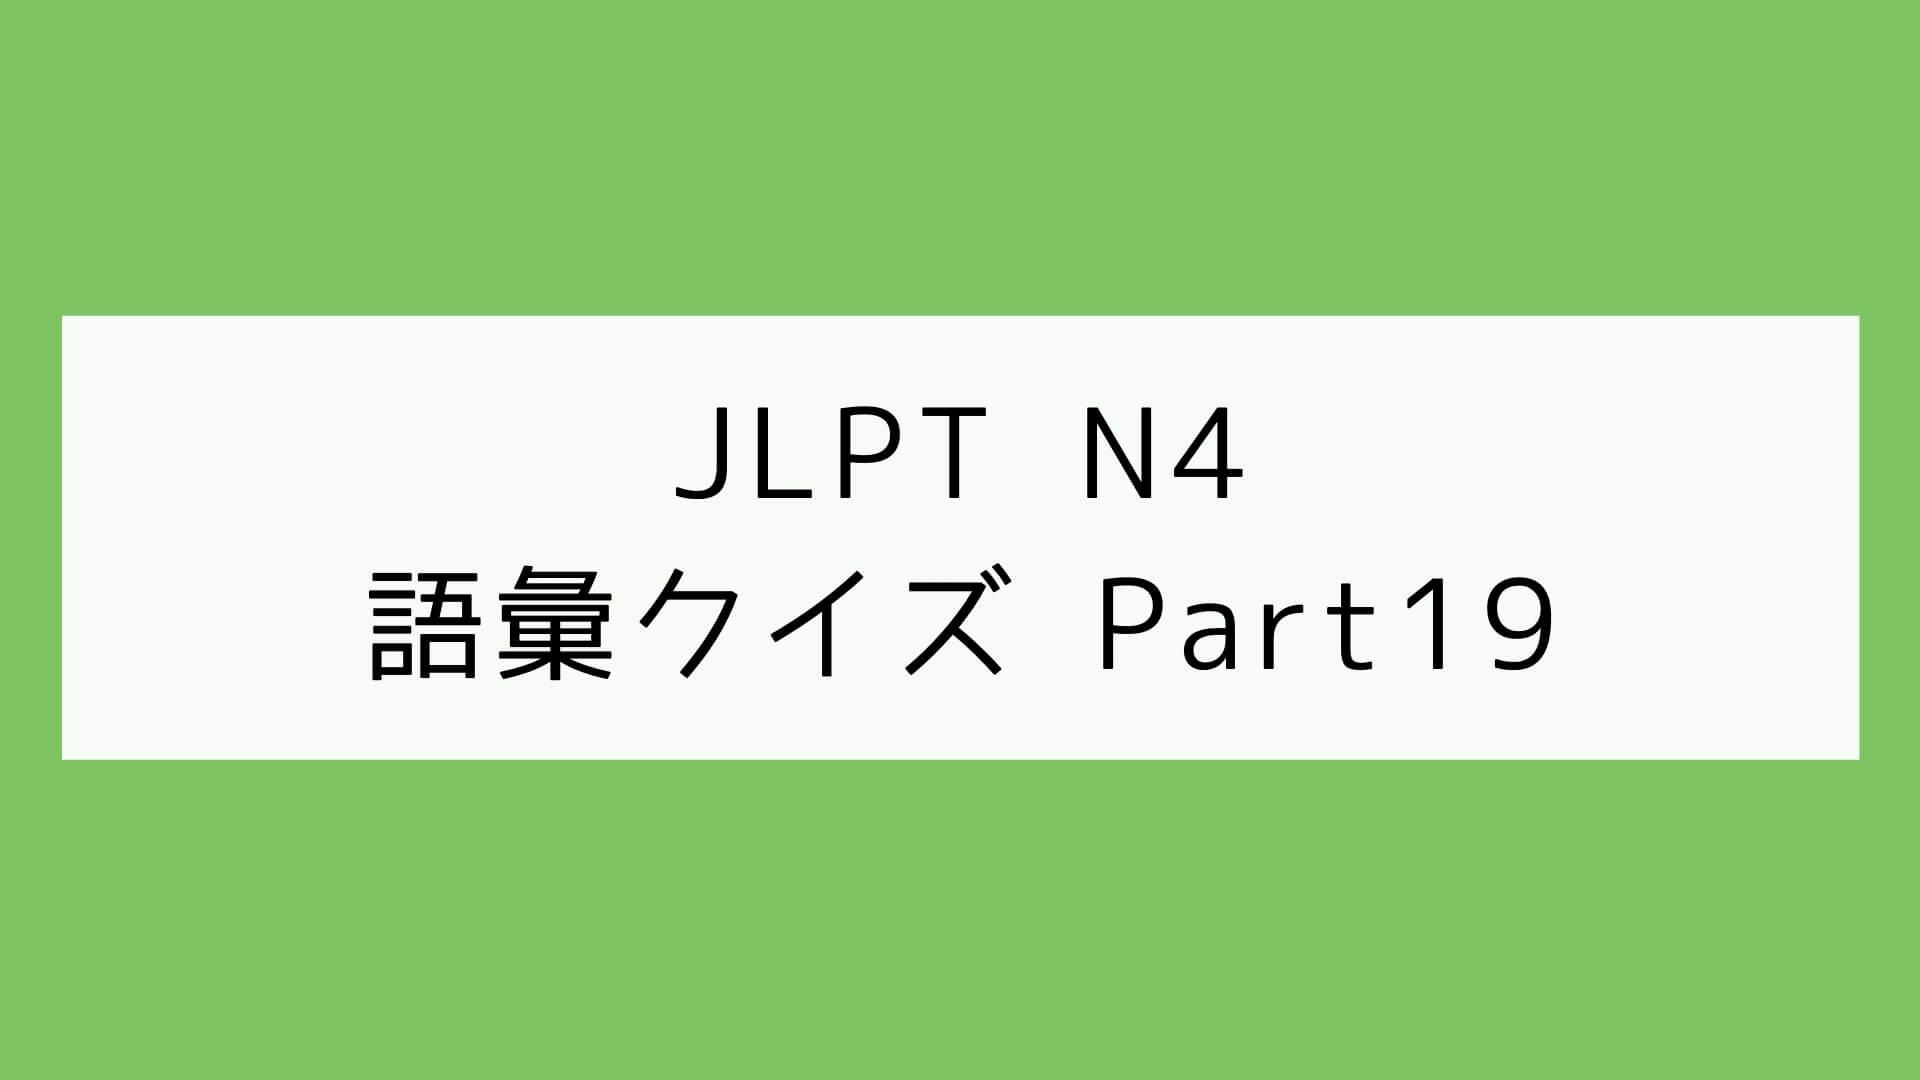 【JLPT N4】語彙クイズ Part19